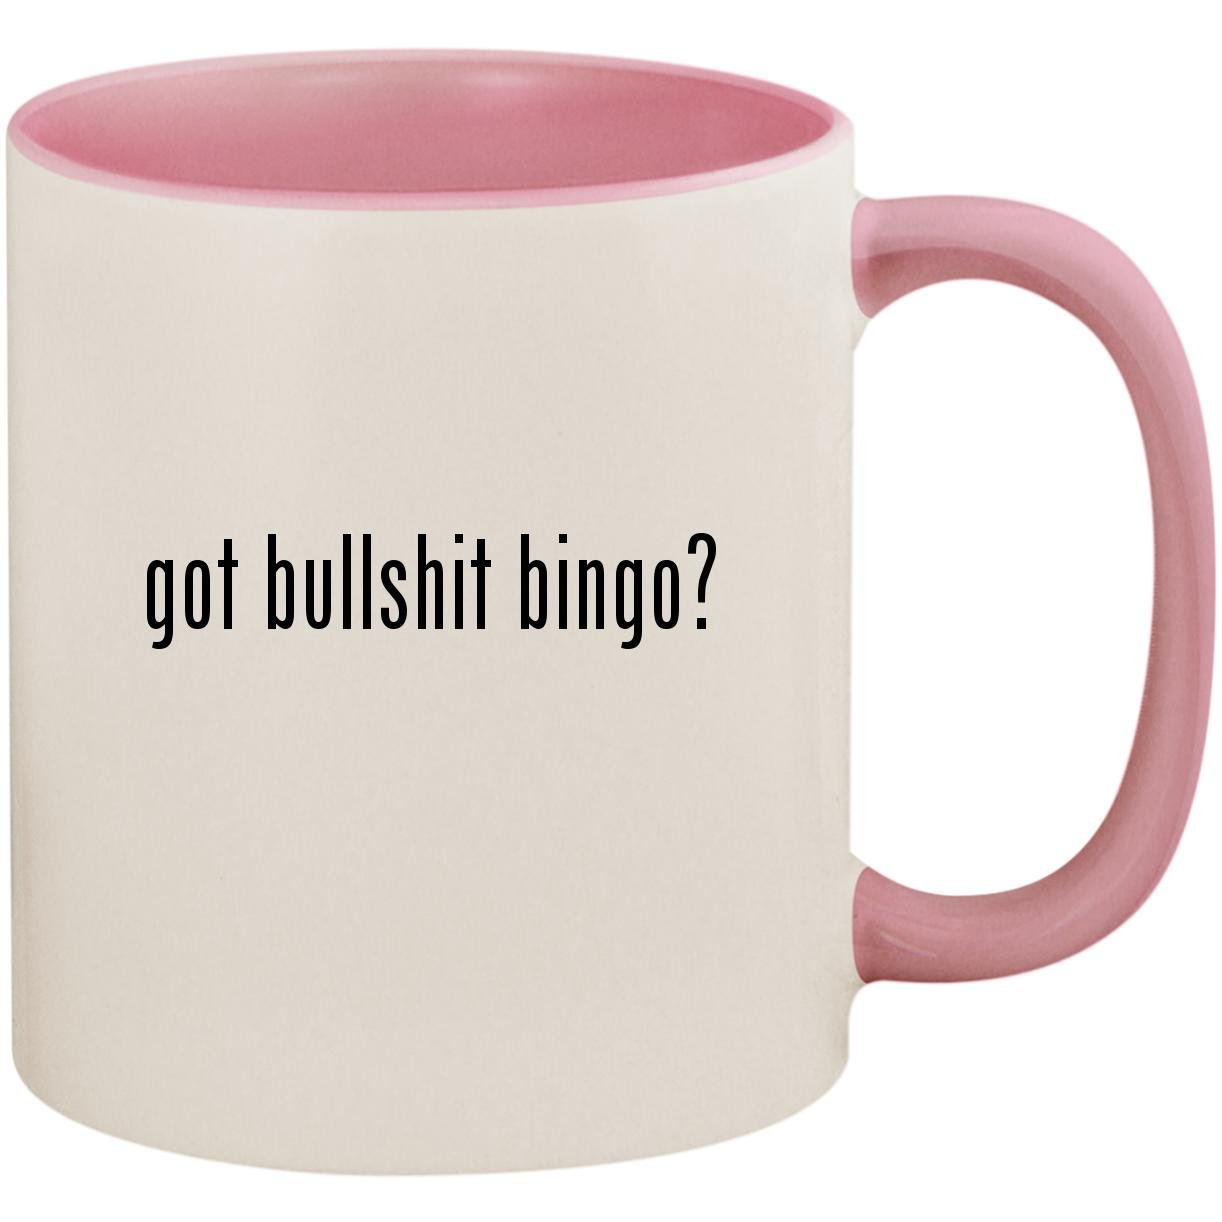 got bullshit bingo? - 11oz Ceramic Colored Inside and Handle Coffee Mug Cup, Pink